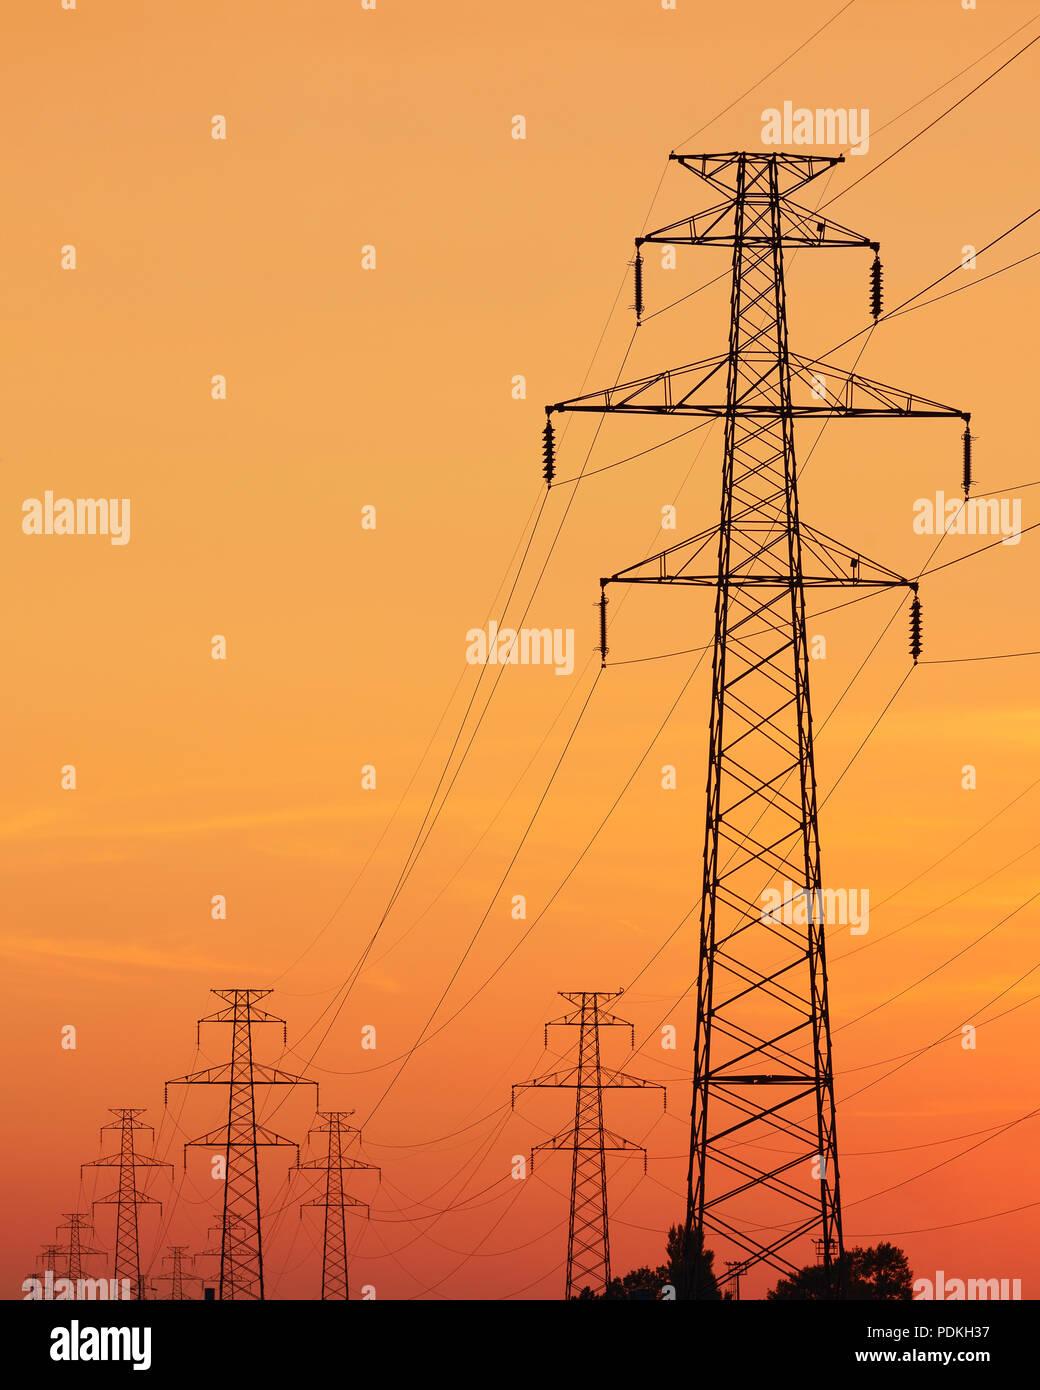 Electricity Pylon at Sunset - Stock Image